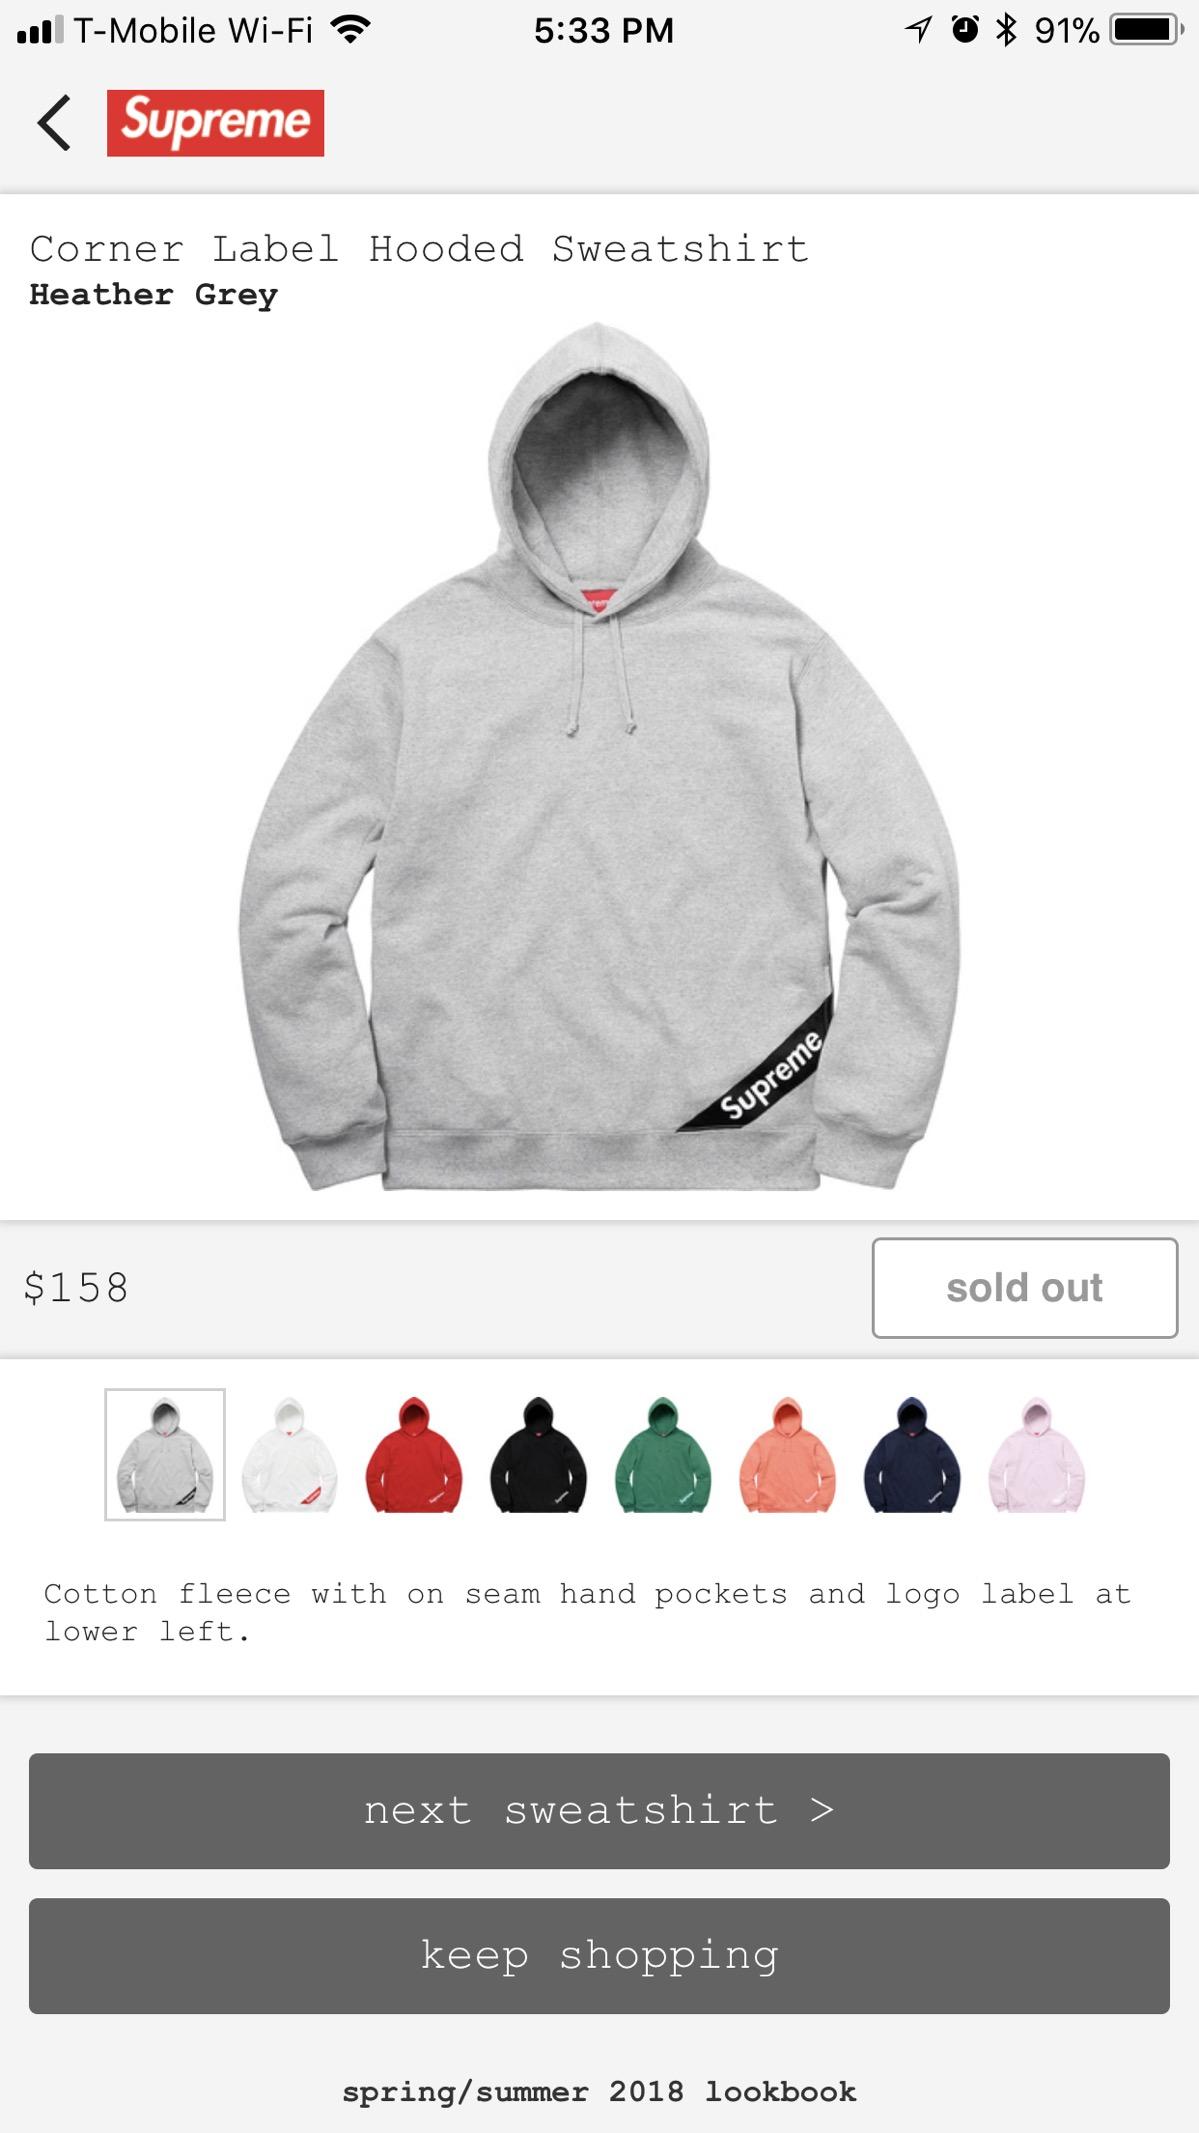 Supreme Supreme Corner Label Hooded Sweatshirt Heather Grey [ 2133 x 1199 Pixel ]